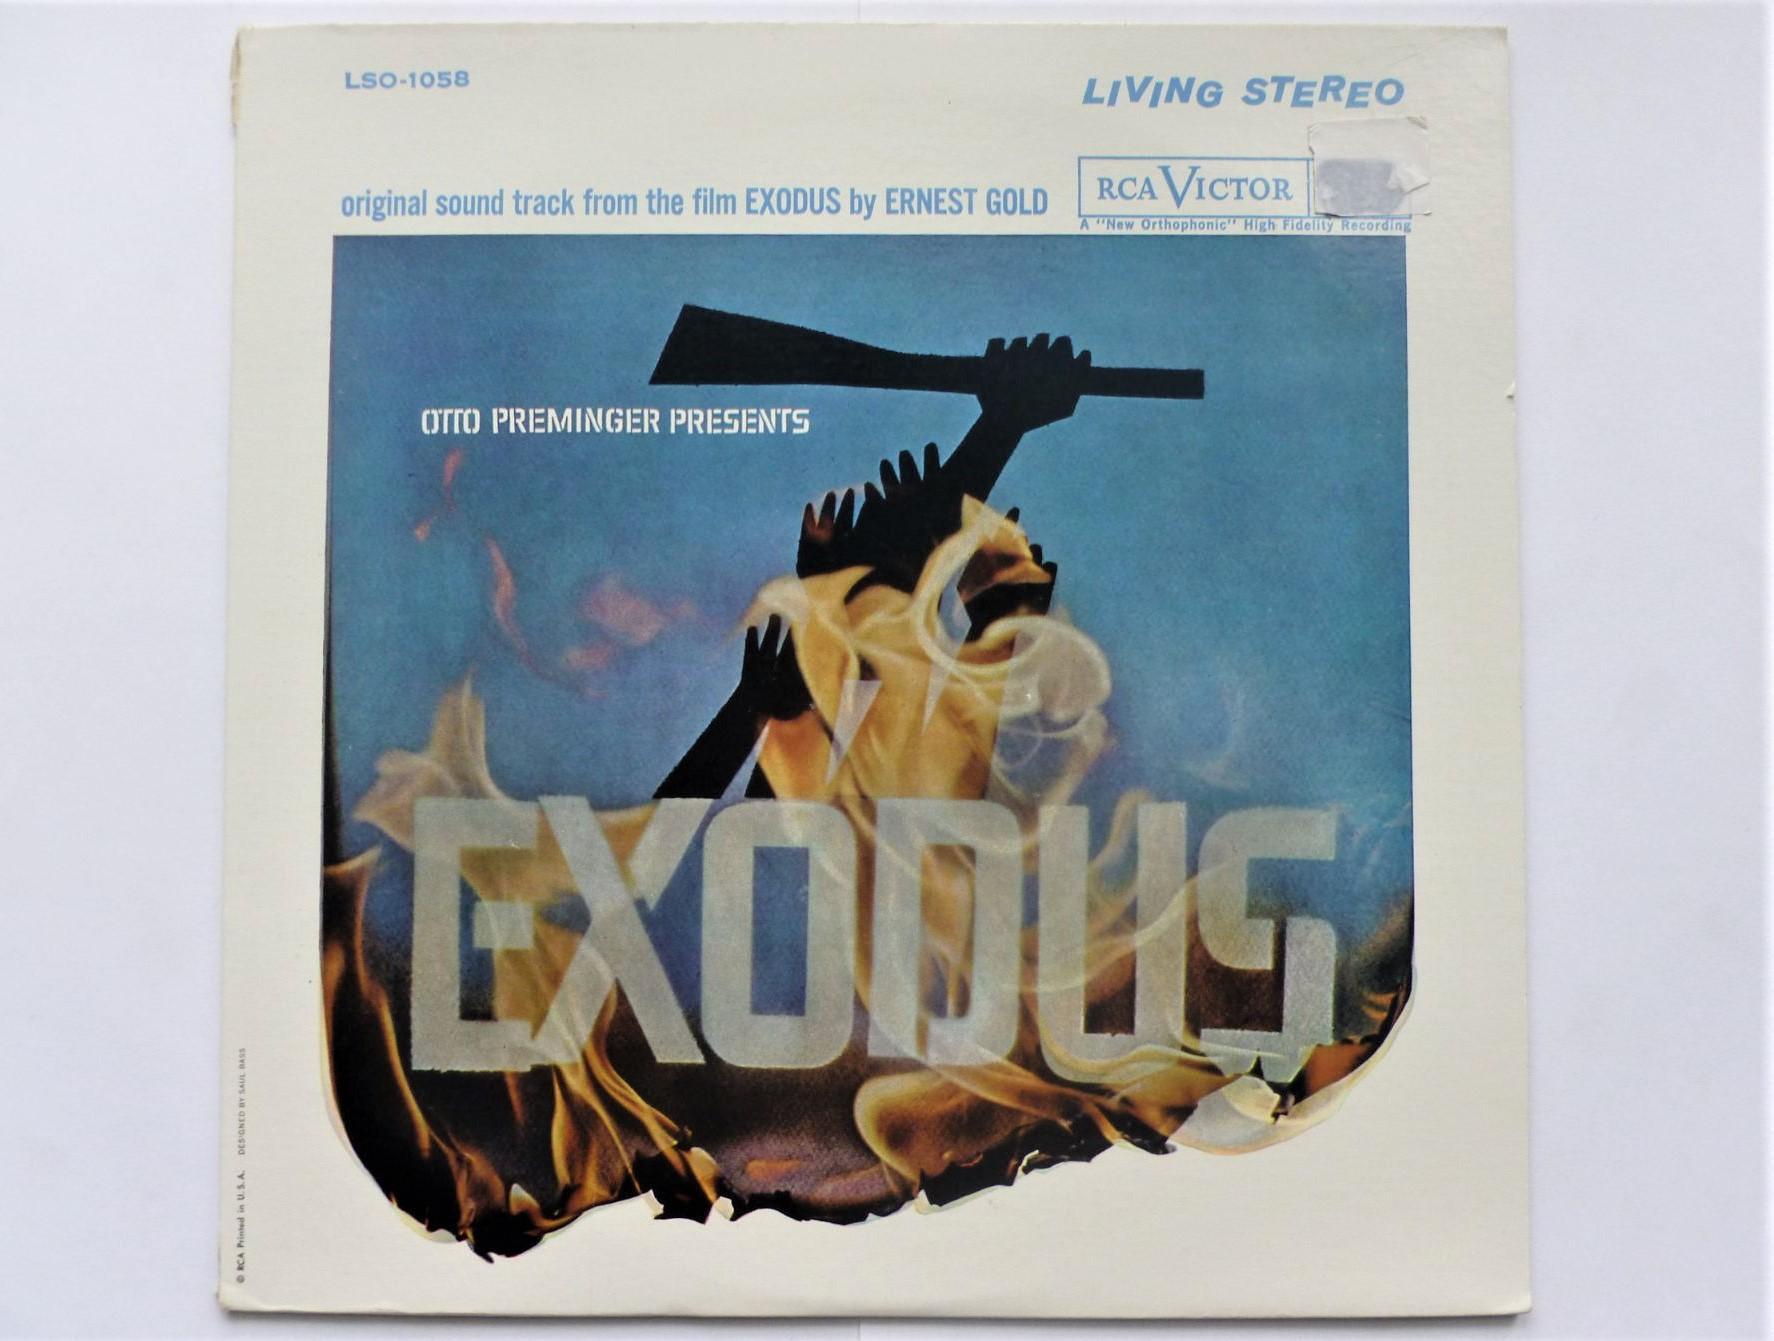 VARIOUS - Exodus - LP